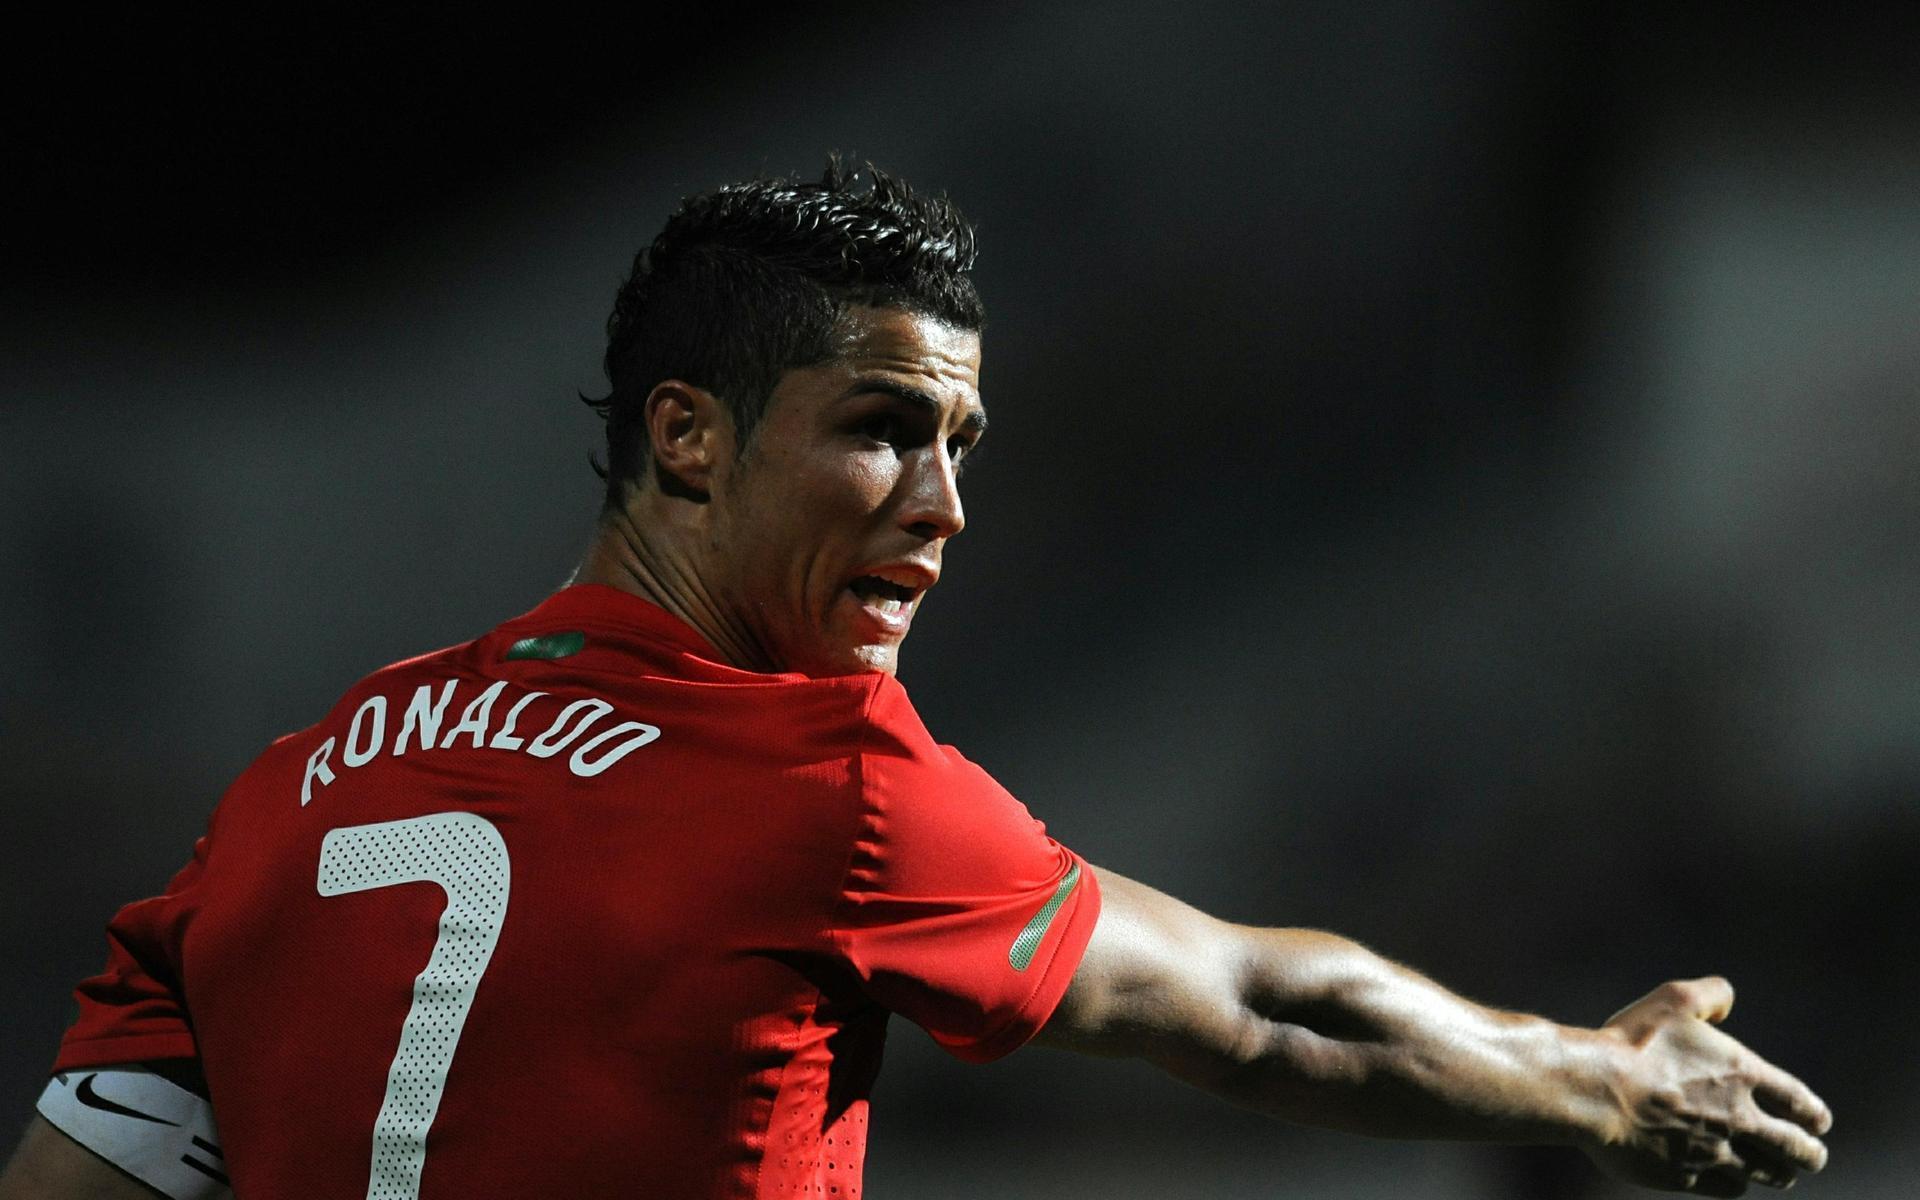 Cristiano Ronaldo Profil Wallpaper Images #385 Wallpaper | High ...